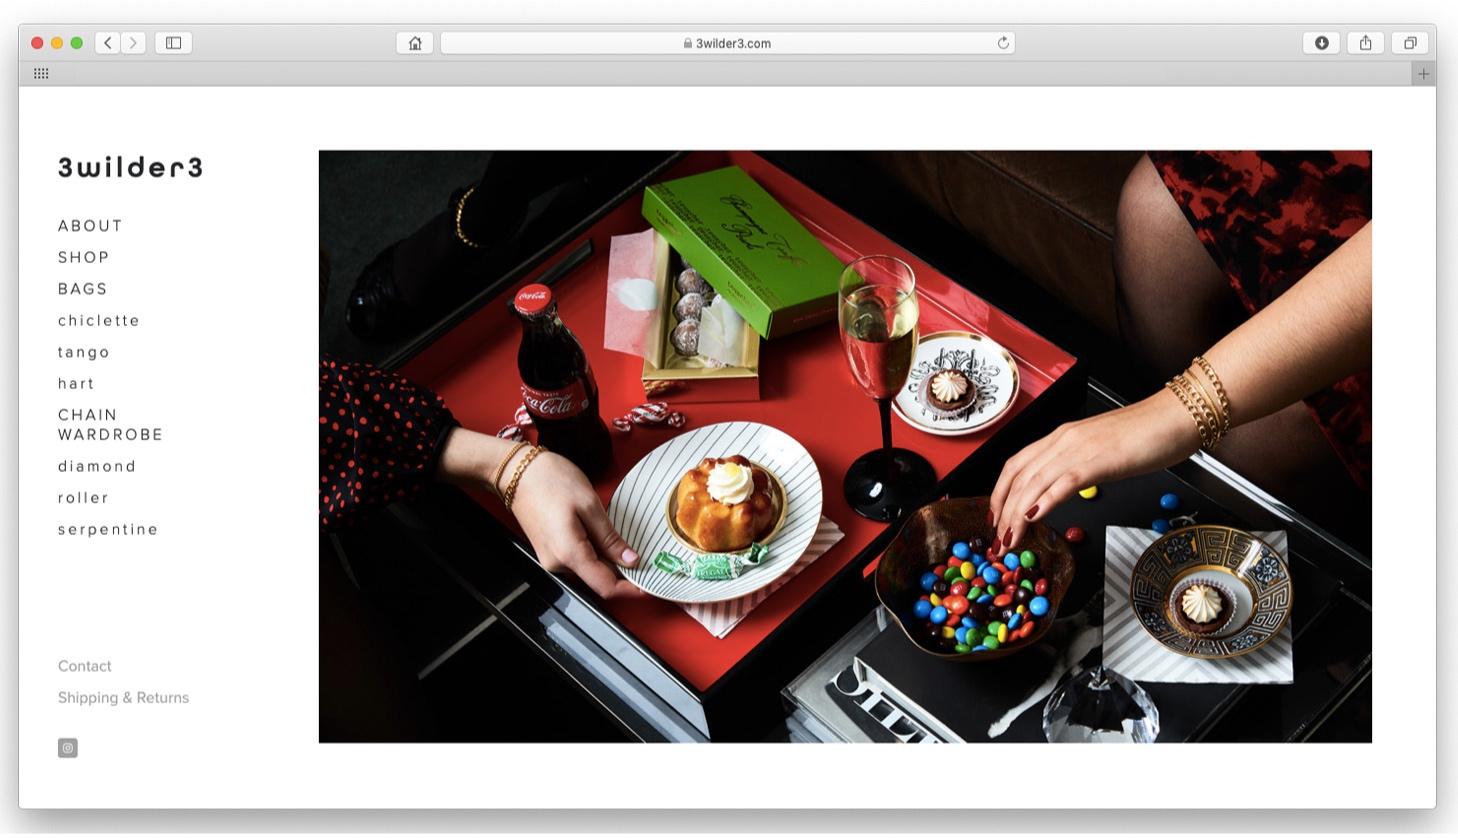 website design lace photo